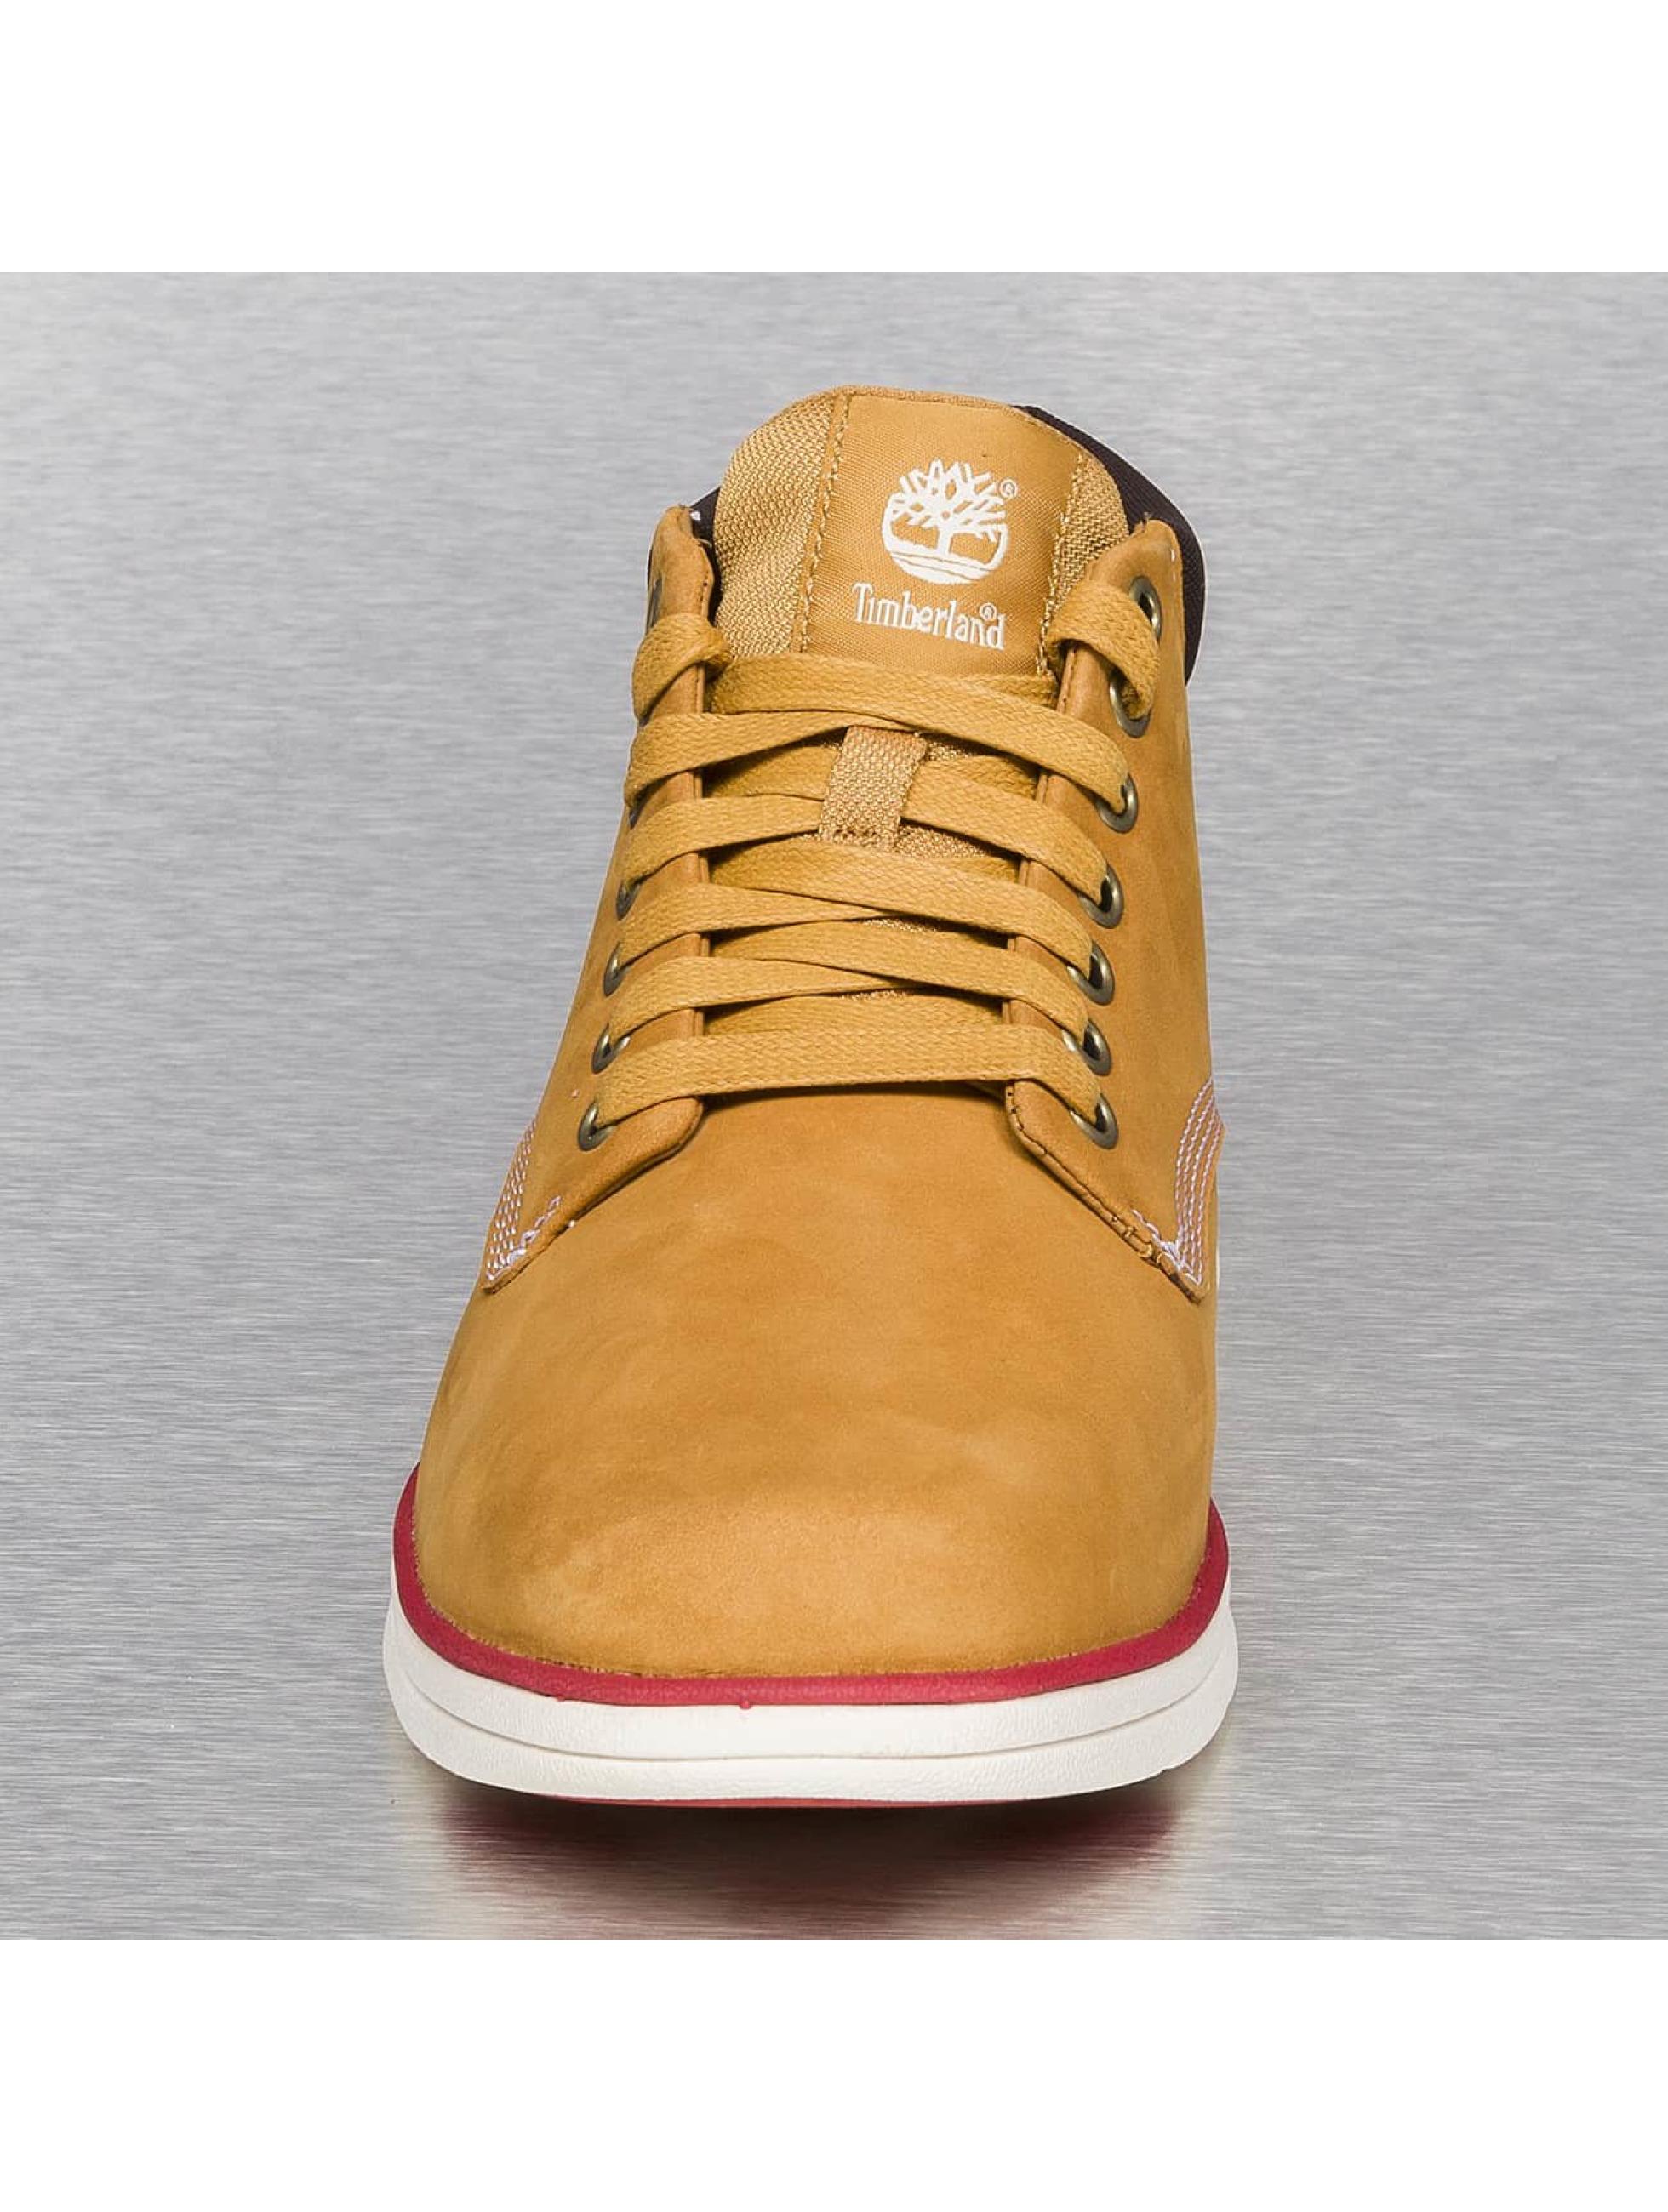 Timberland Sneakers Chukka Leather bezowy